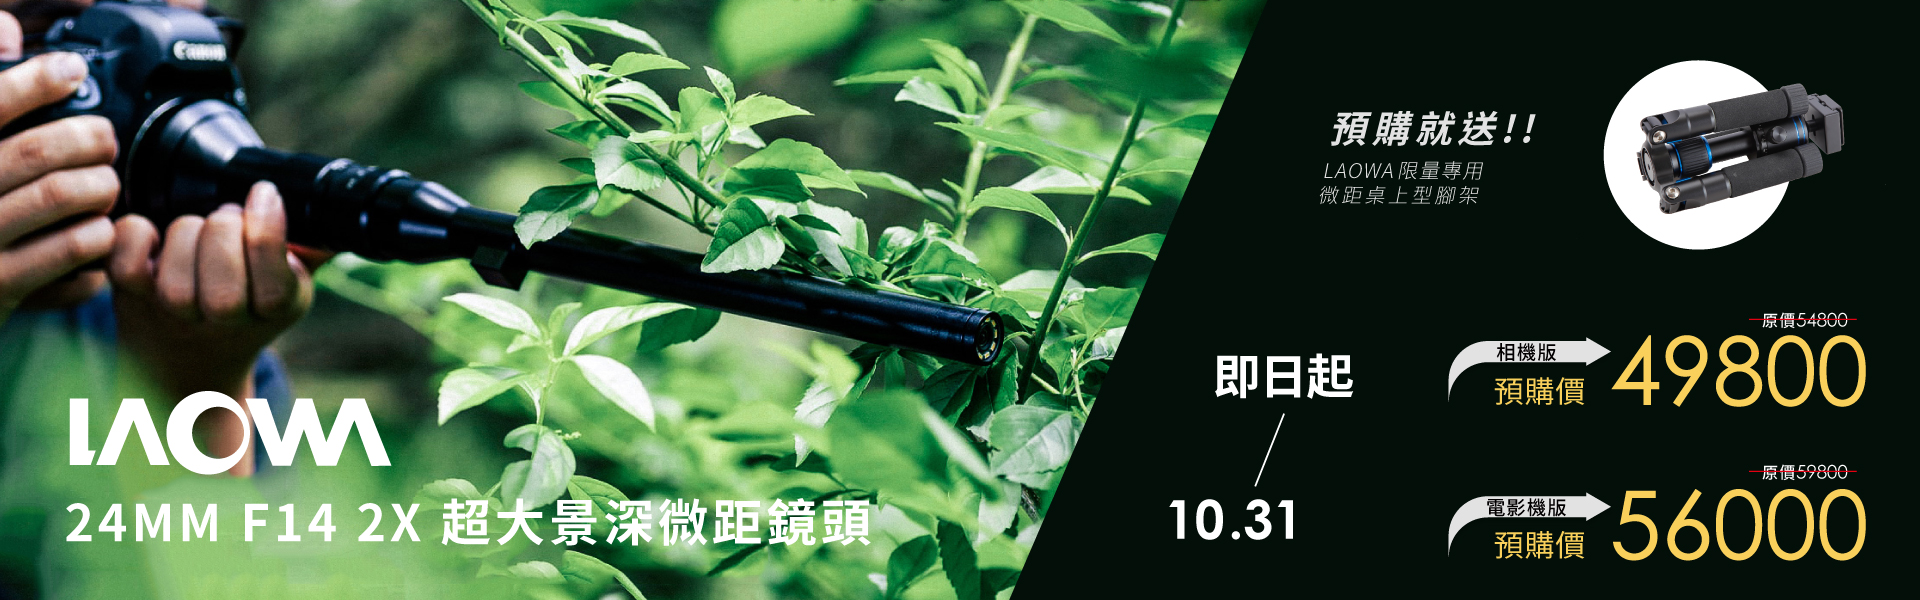 LAOWA  24mm F14 2X Macro Probe 超大景深微距鏡頭預購開跑~